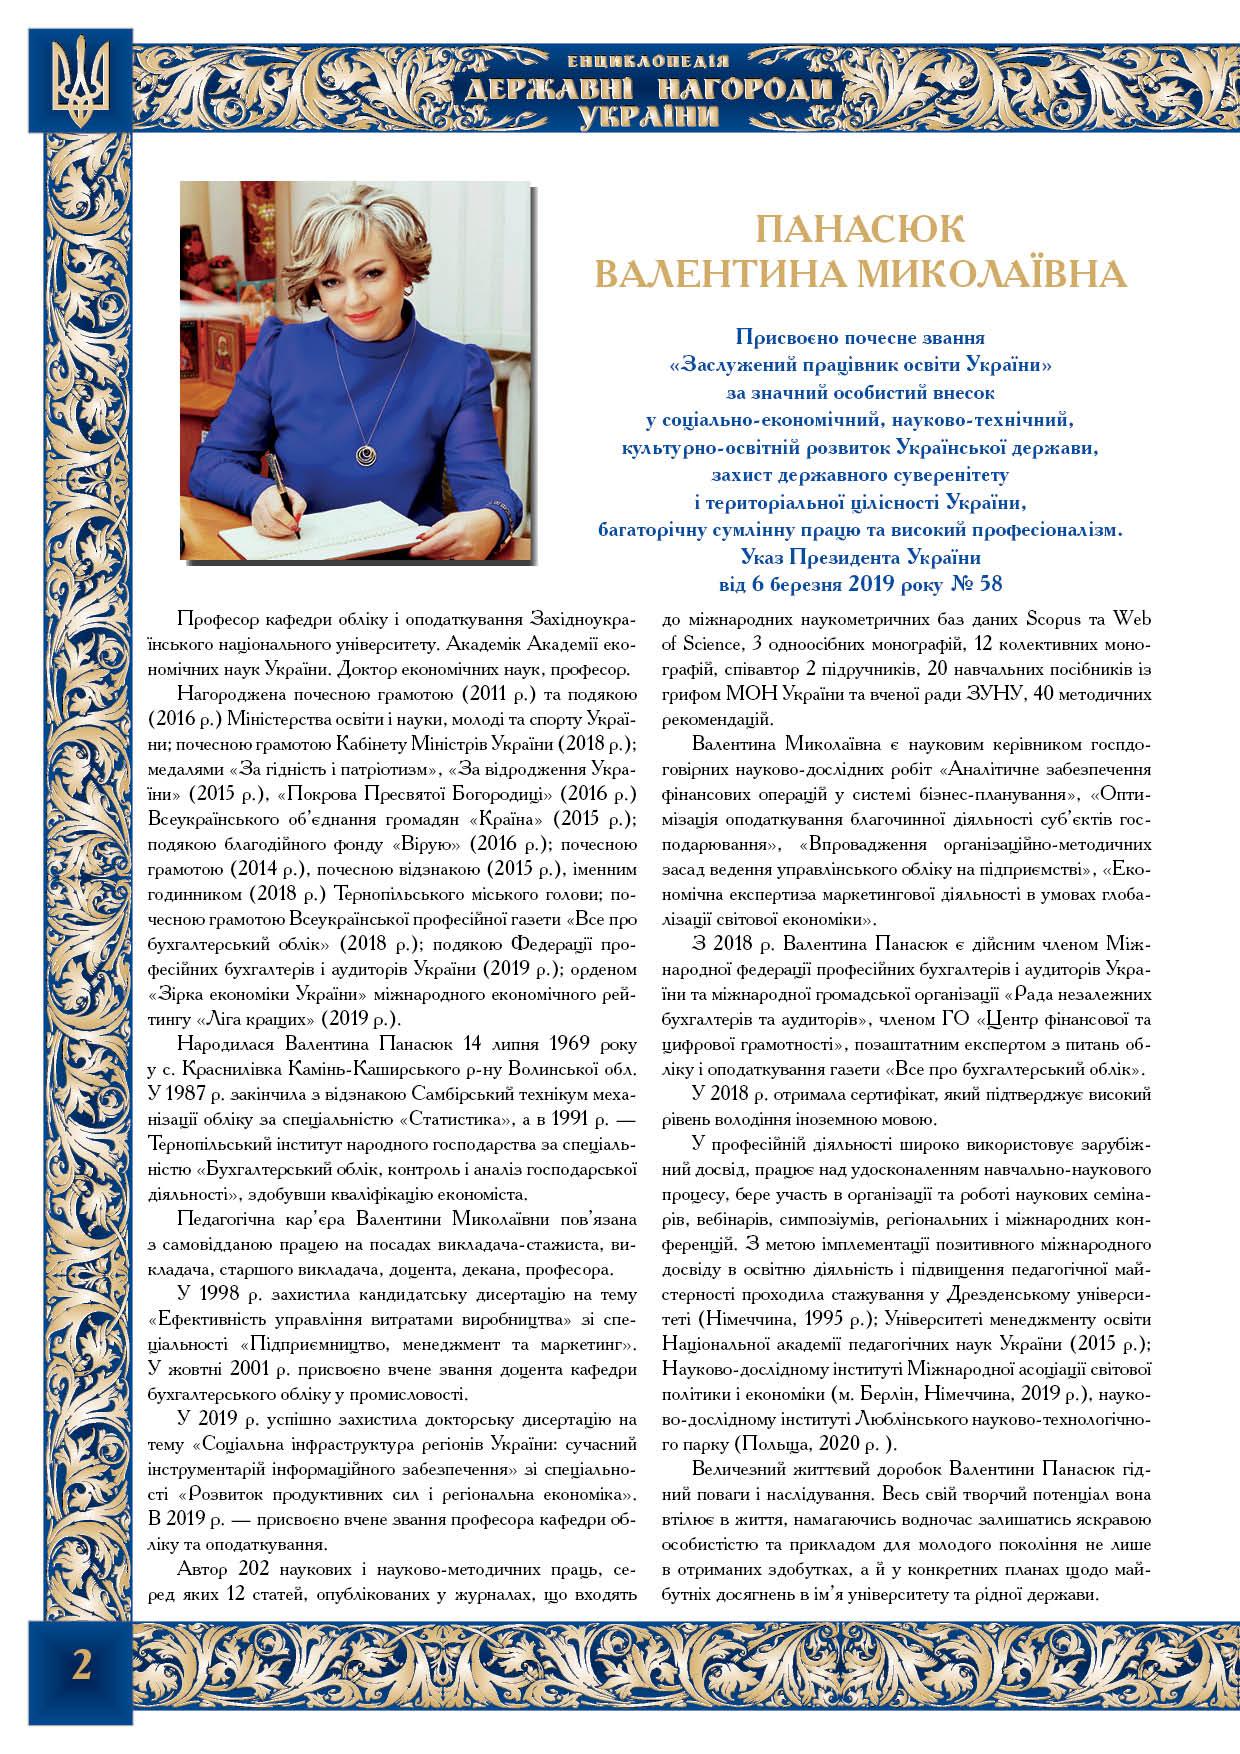 Панасюк Валентина Миколаївна